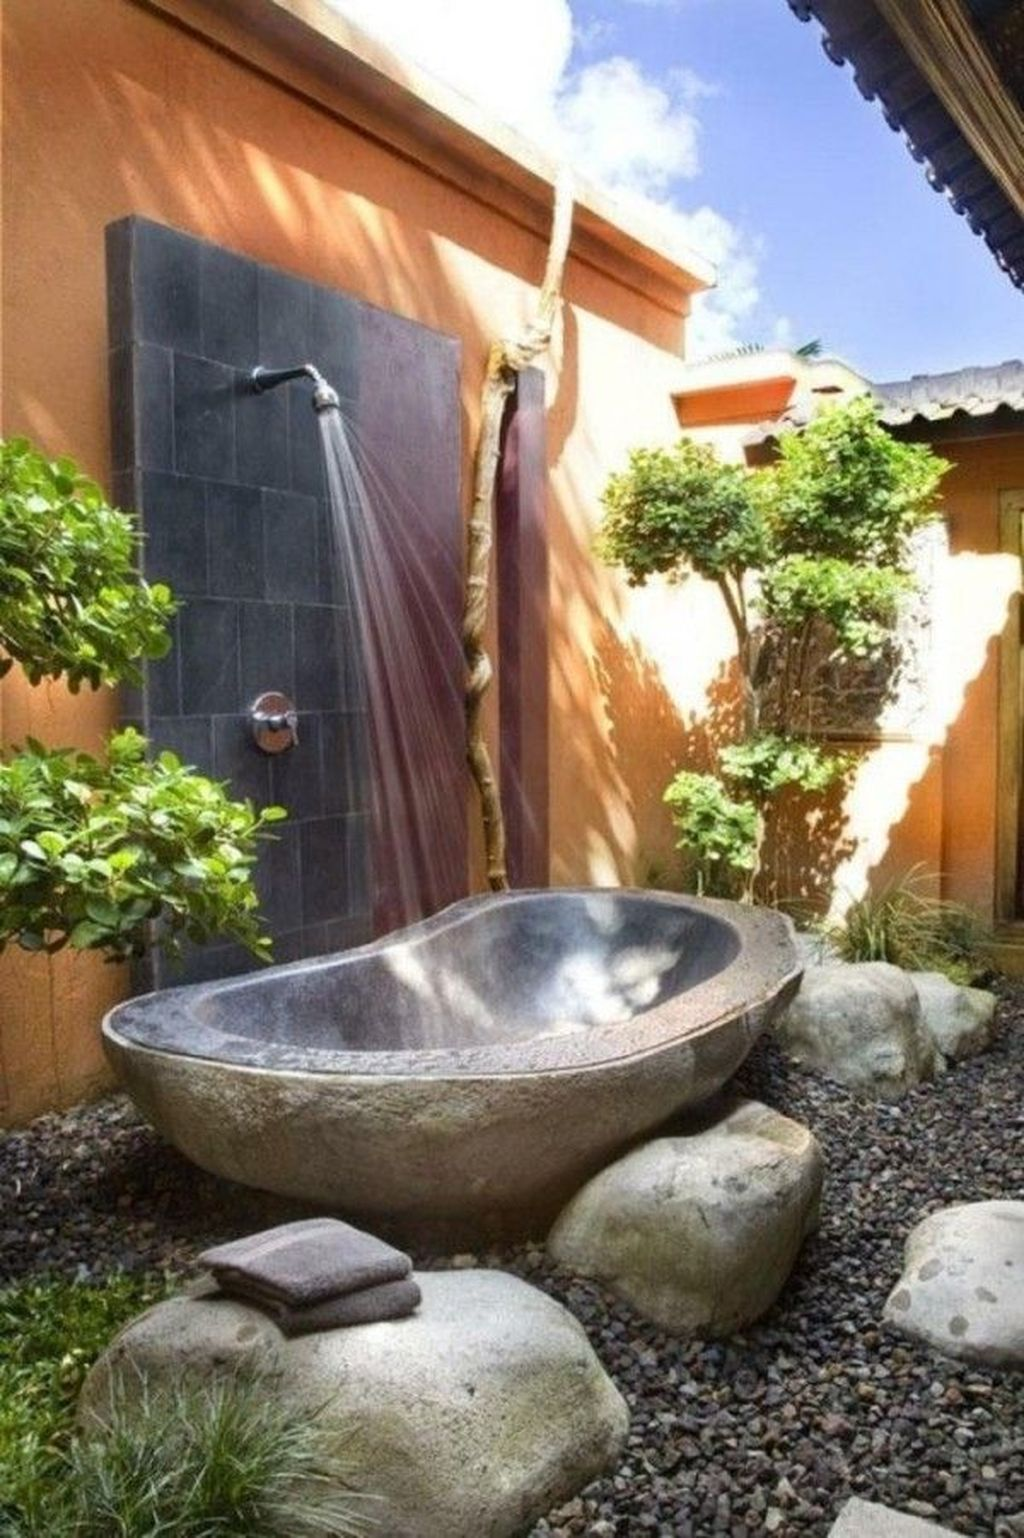 Creative Outdoor Bathroom Design Ideas For Enjoying Summer 26